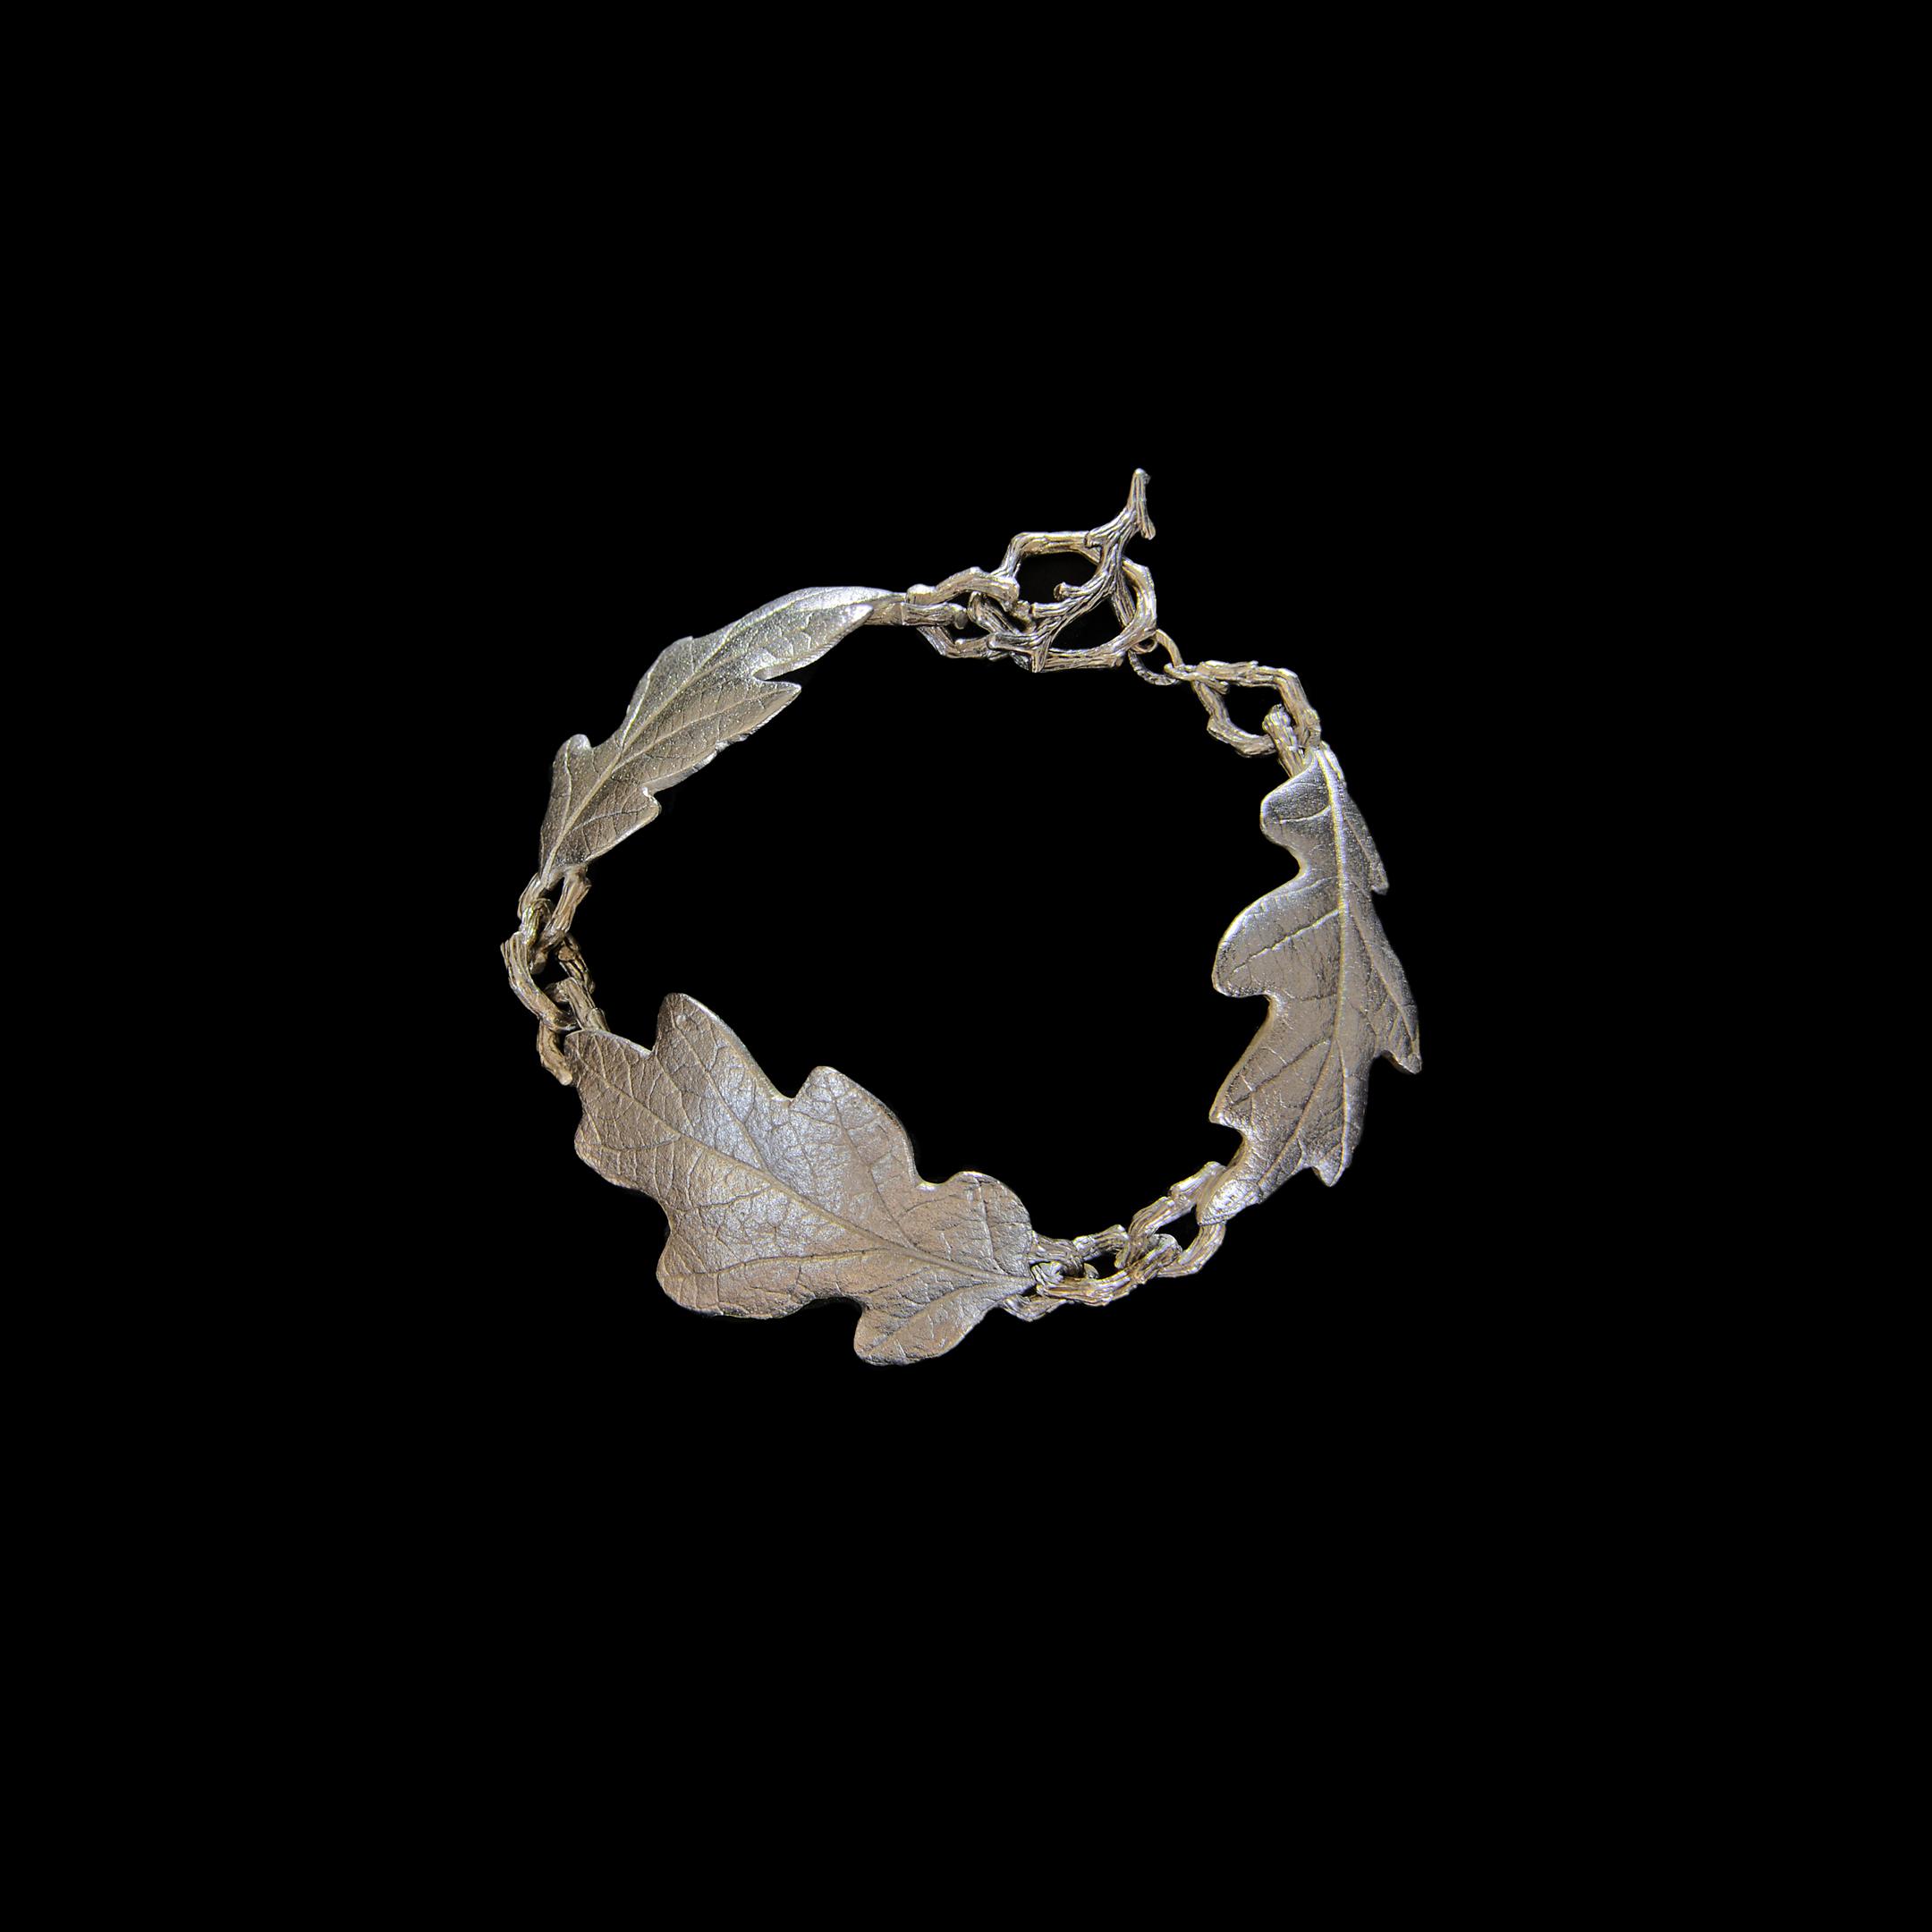 oak-leaf-bracelet-michelle-hoting copy.jpg